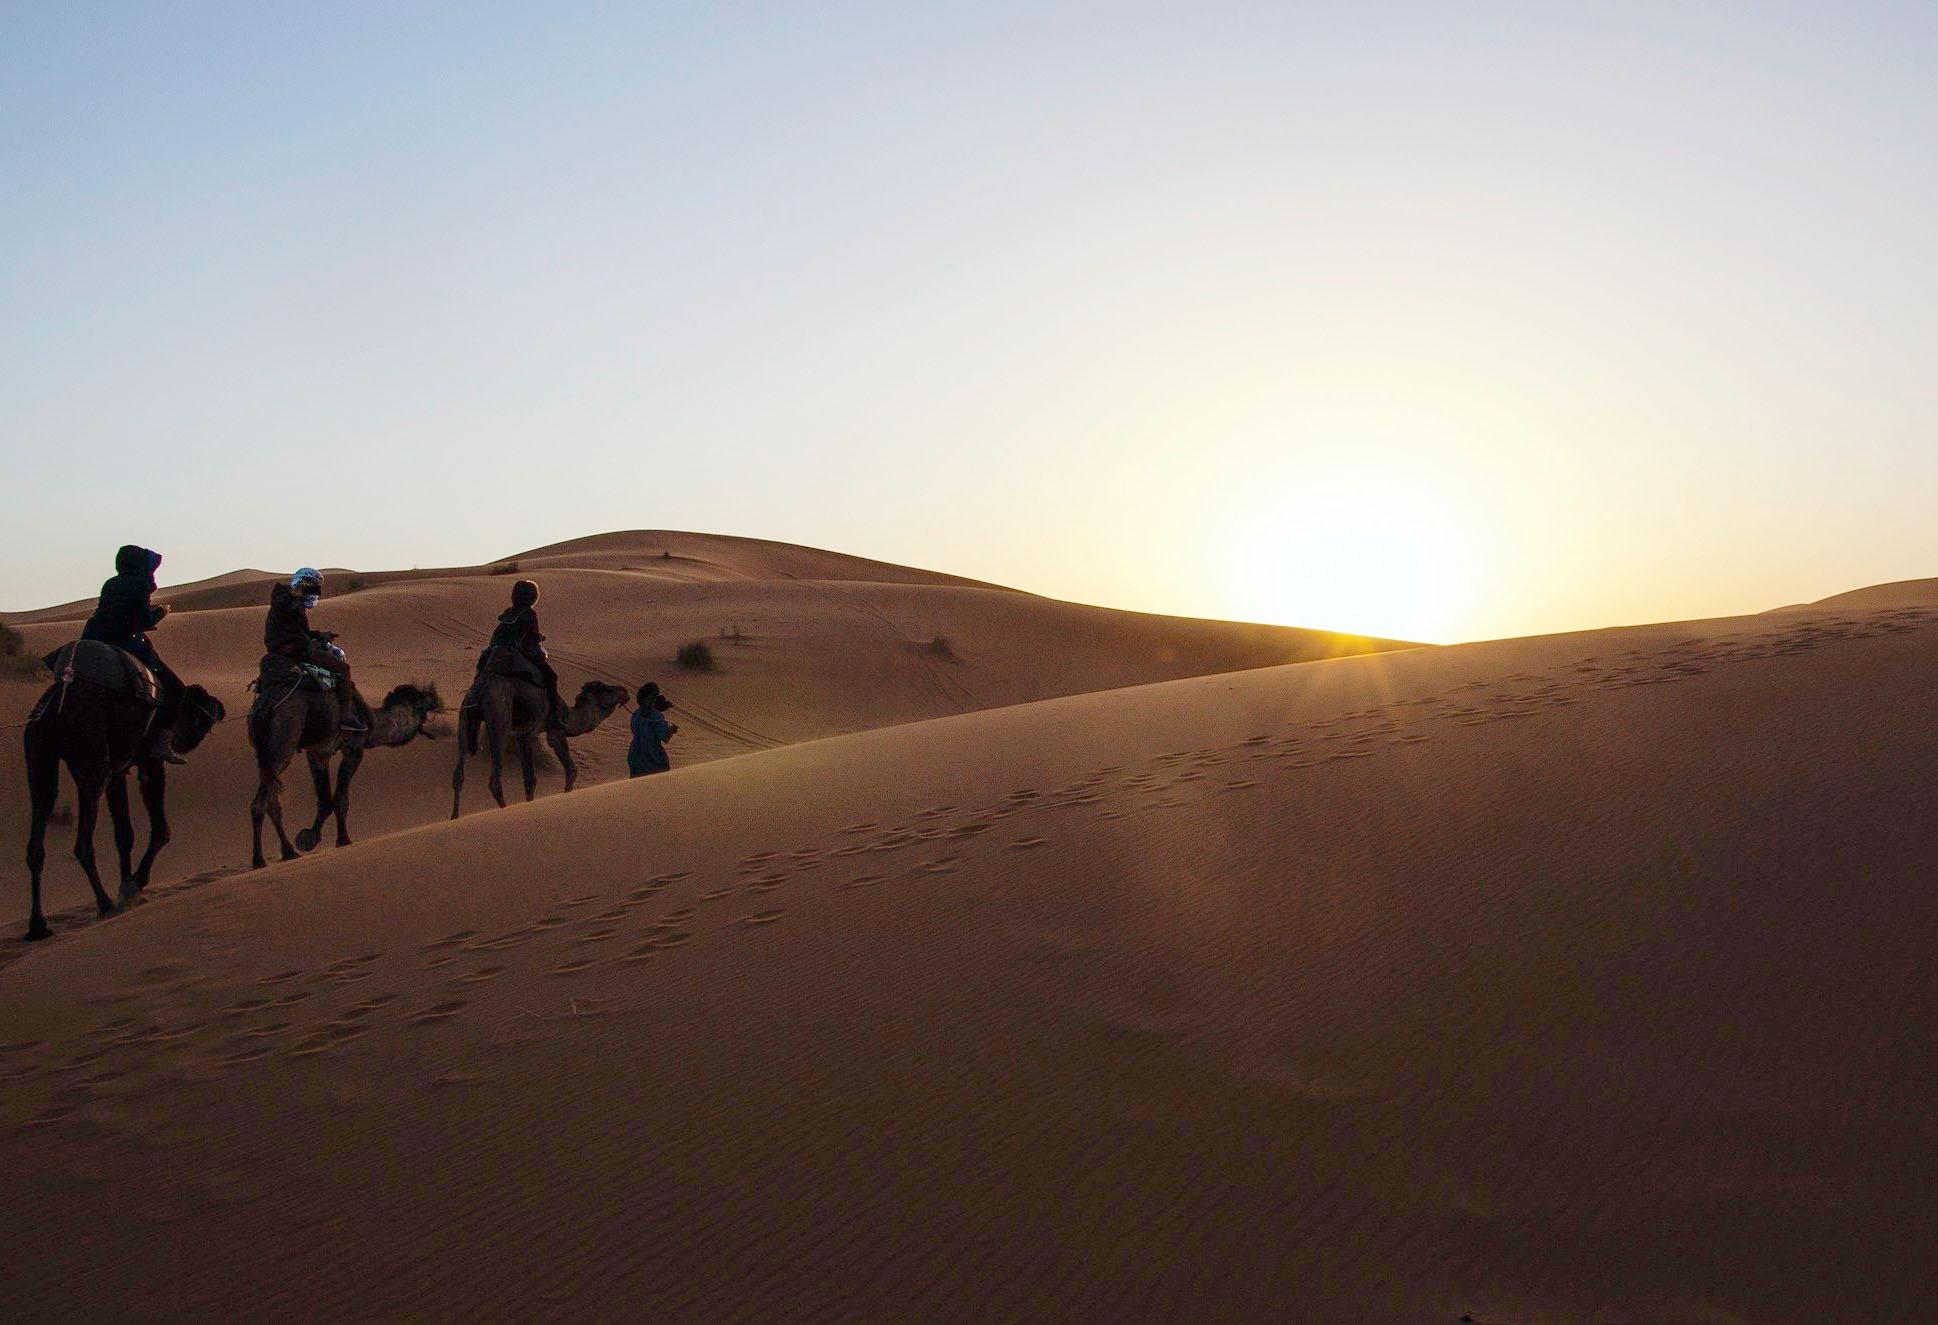 Fez Dades Marrakech 3 Days Tour